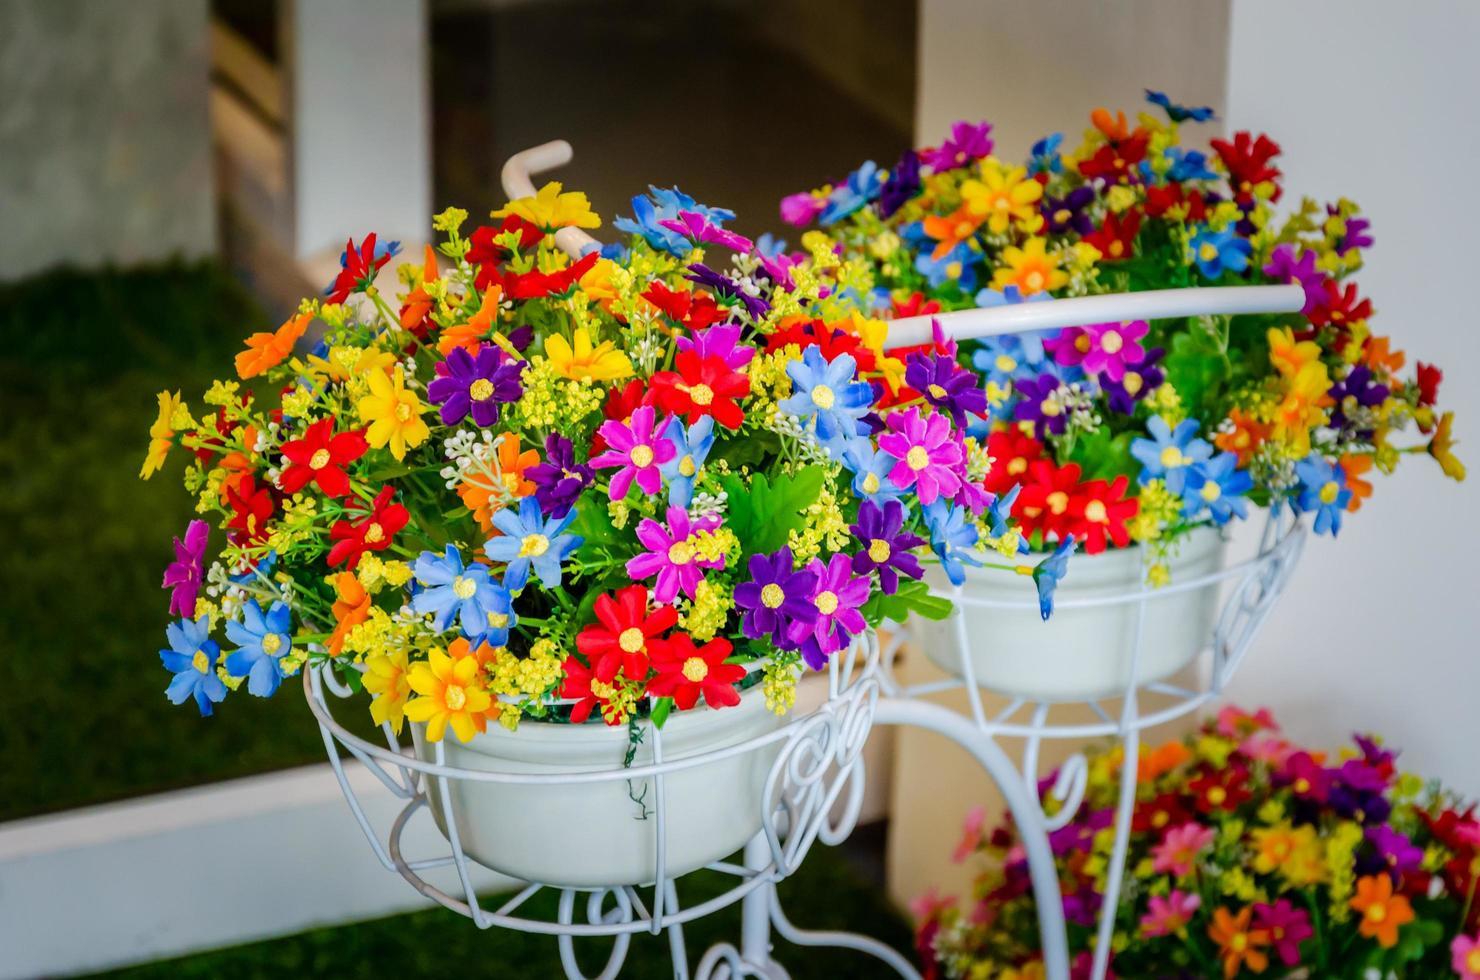 kleurrijke lente bloempotten in wit foto